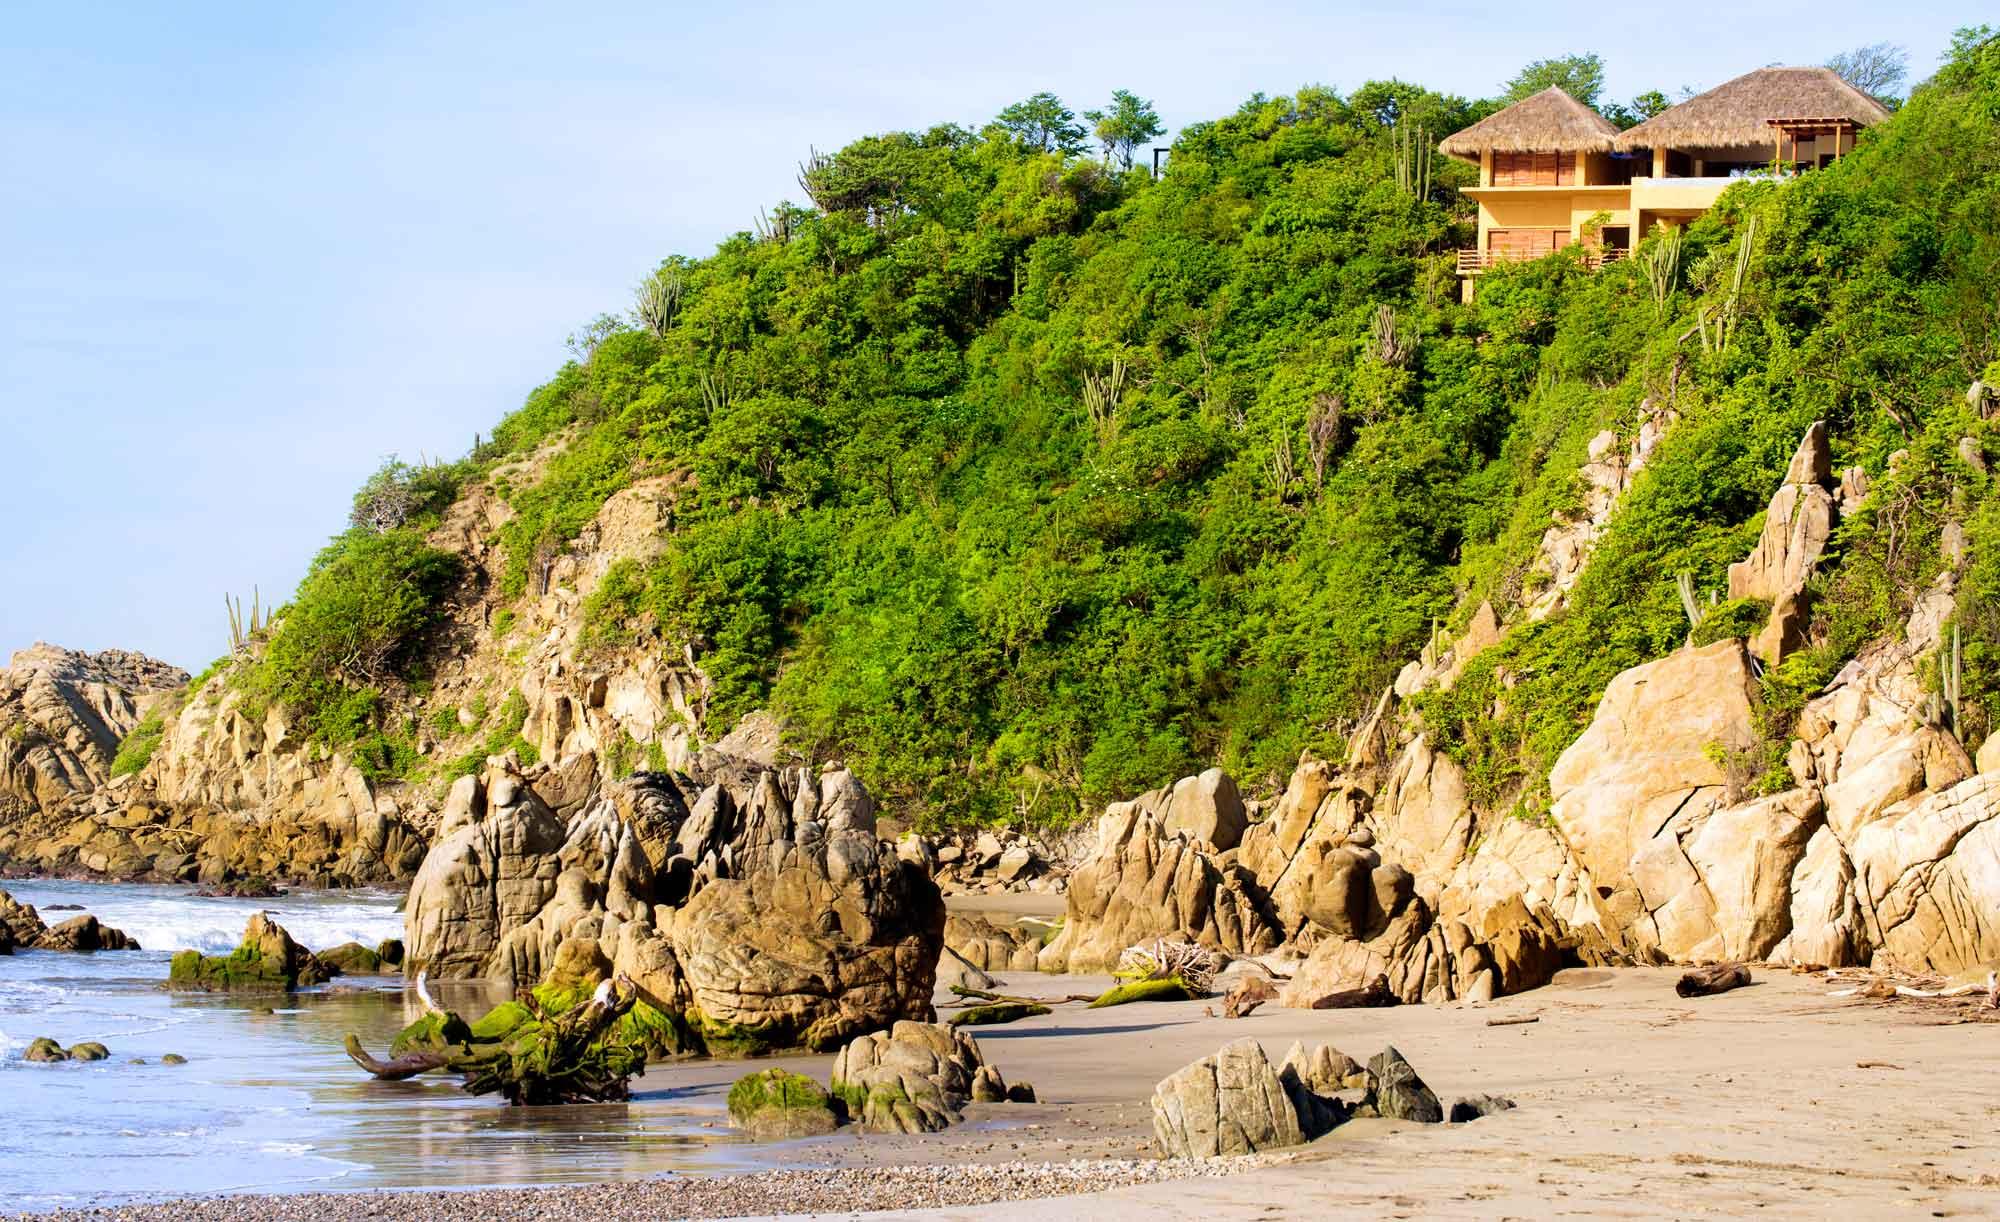 La bocana montecito beach village la bocana publicscrutiny Choice Image